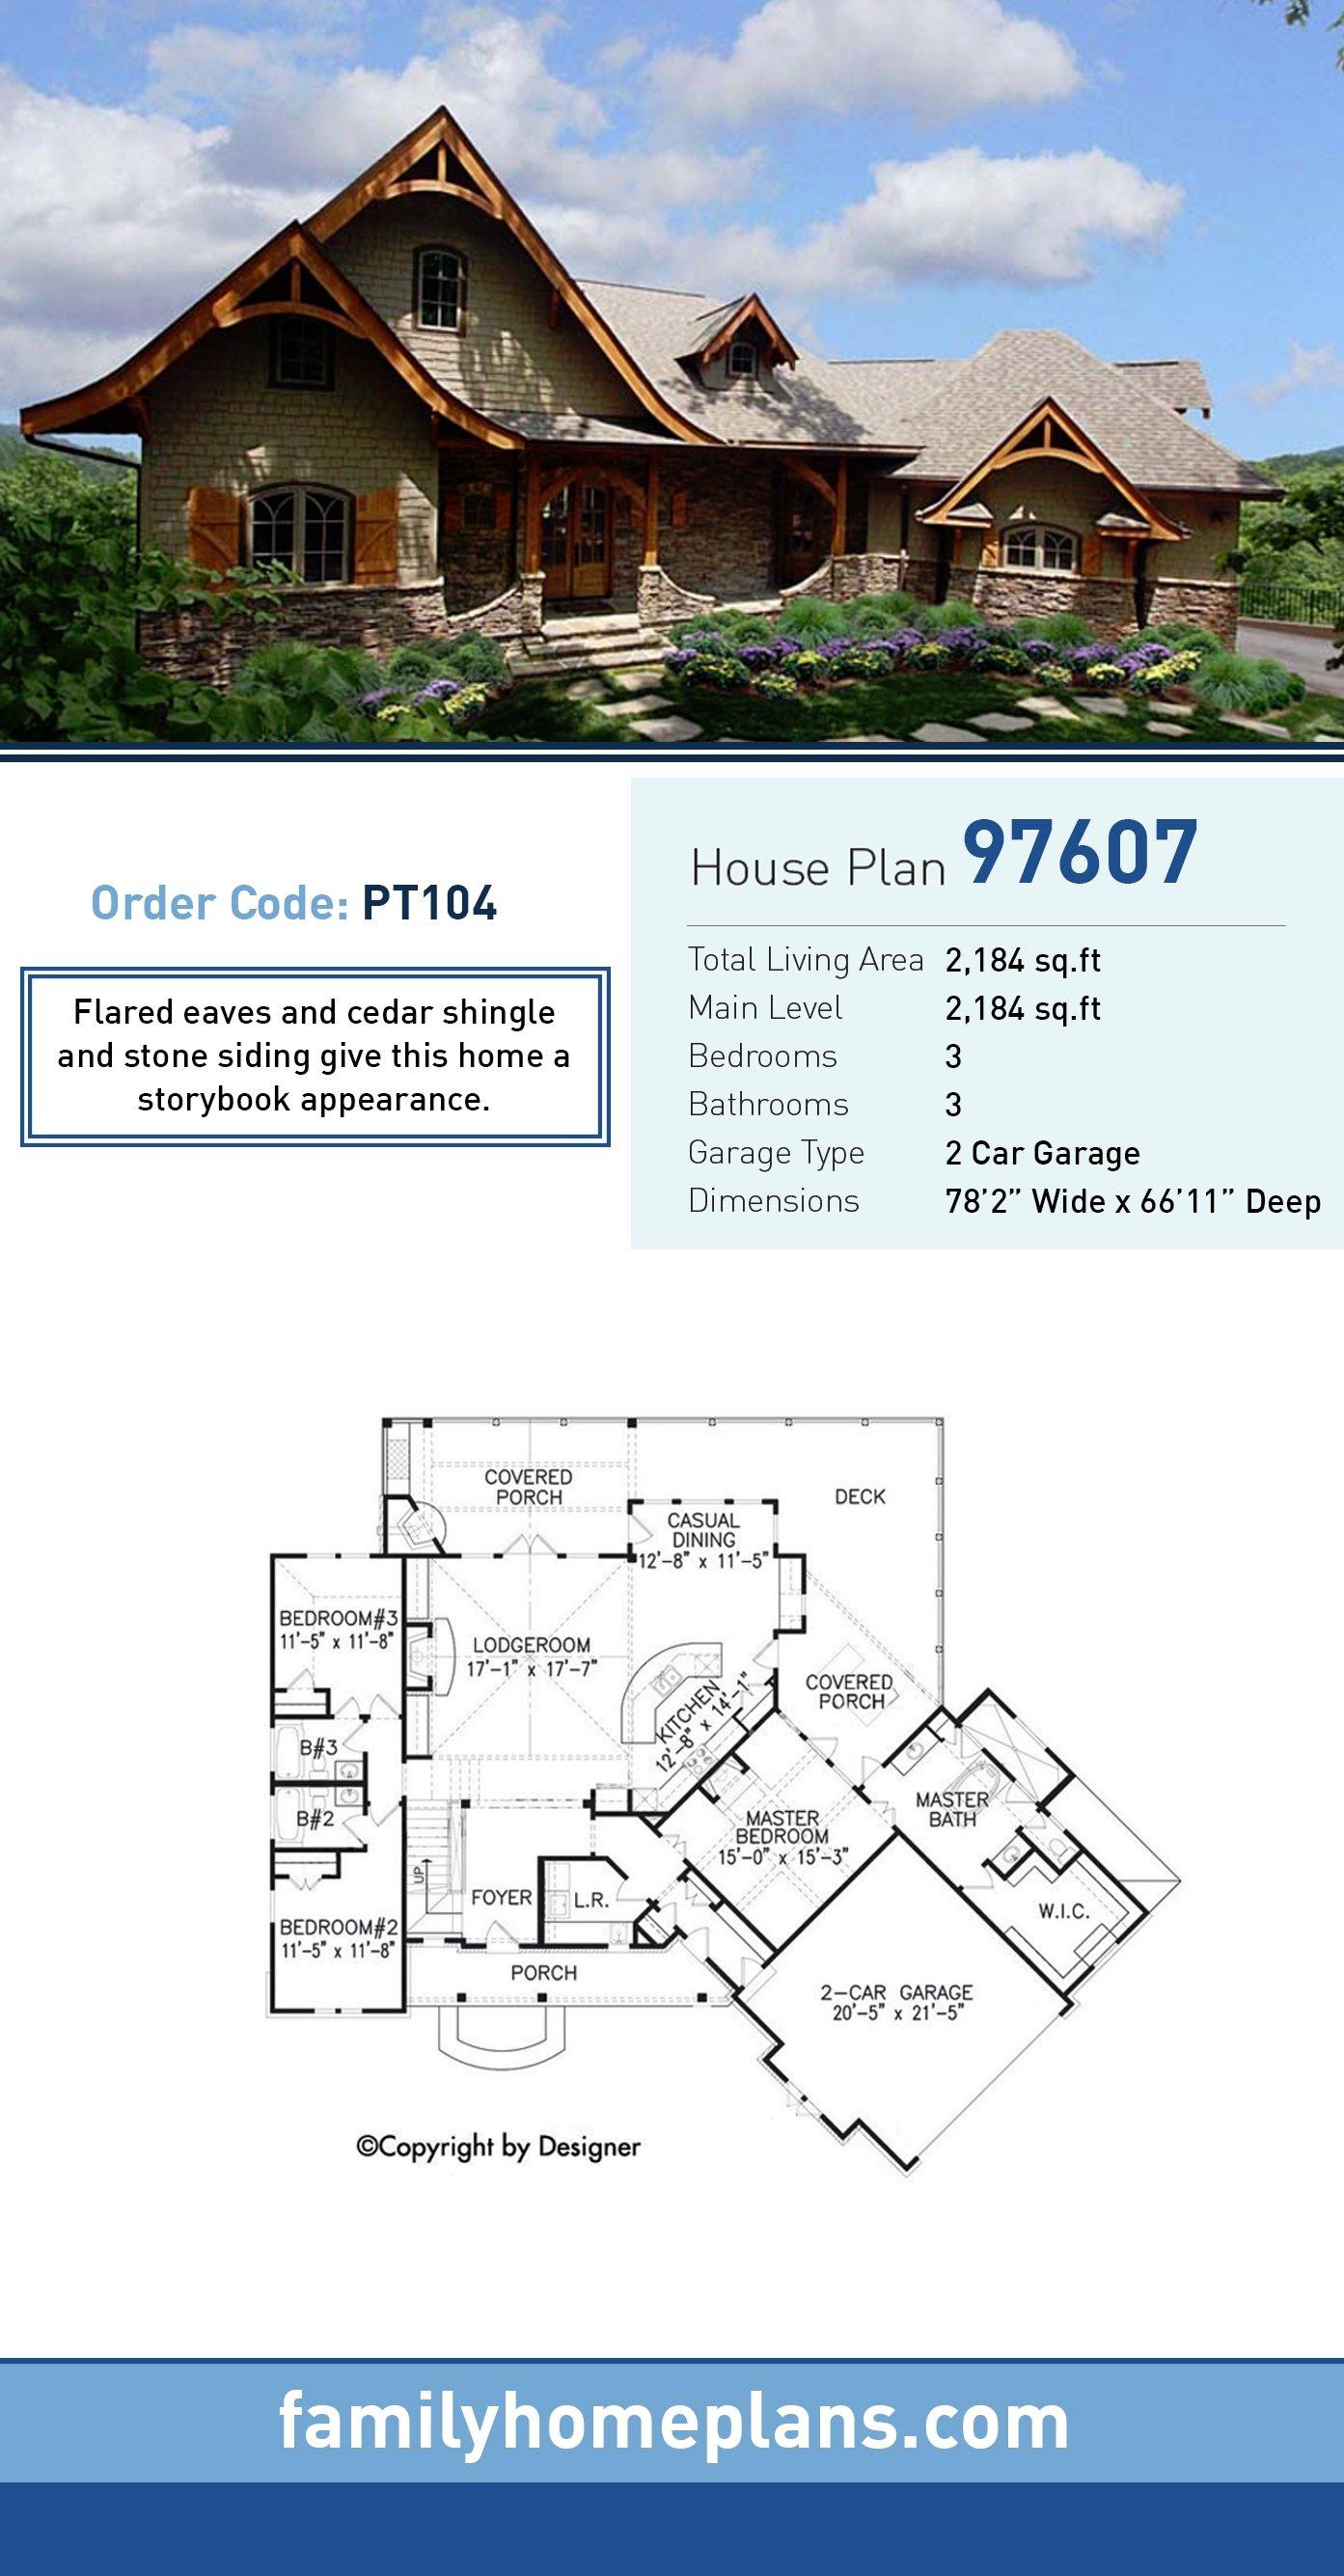 Cottage, Country, Craftsman, European, Tudor House Plan 97607 with 3 Beds, 3 Baths, 2 Car Garage